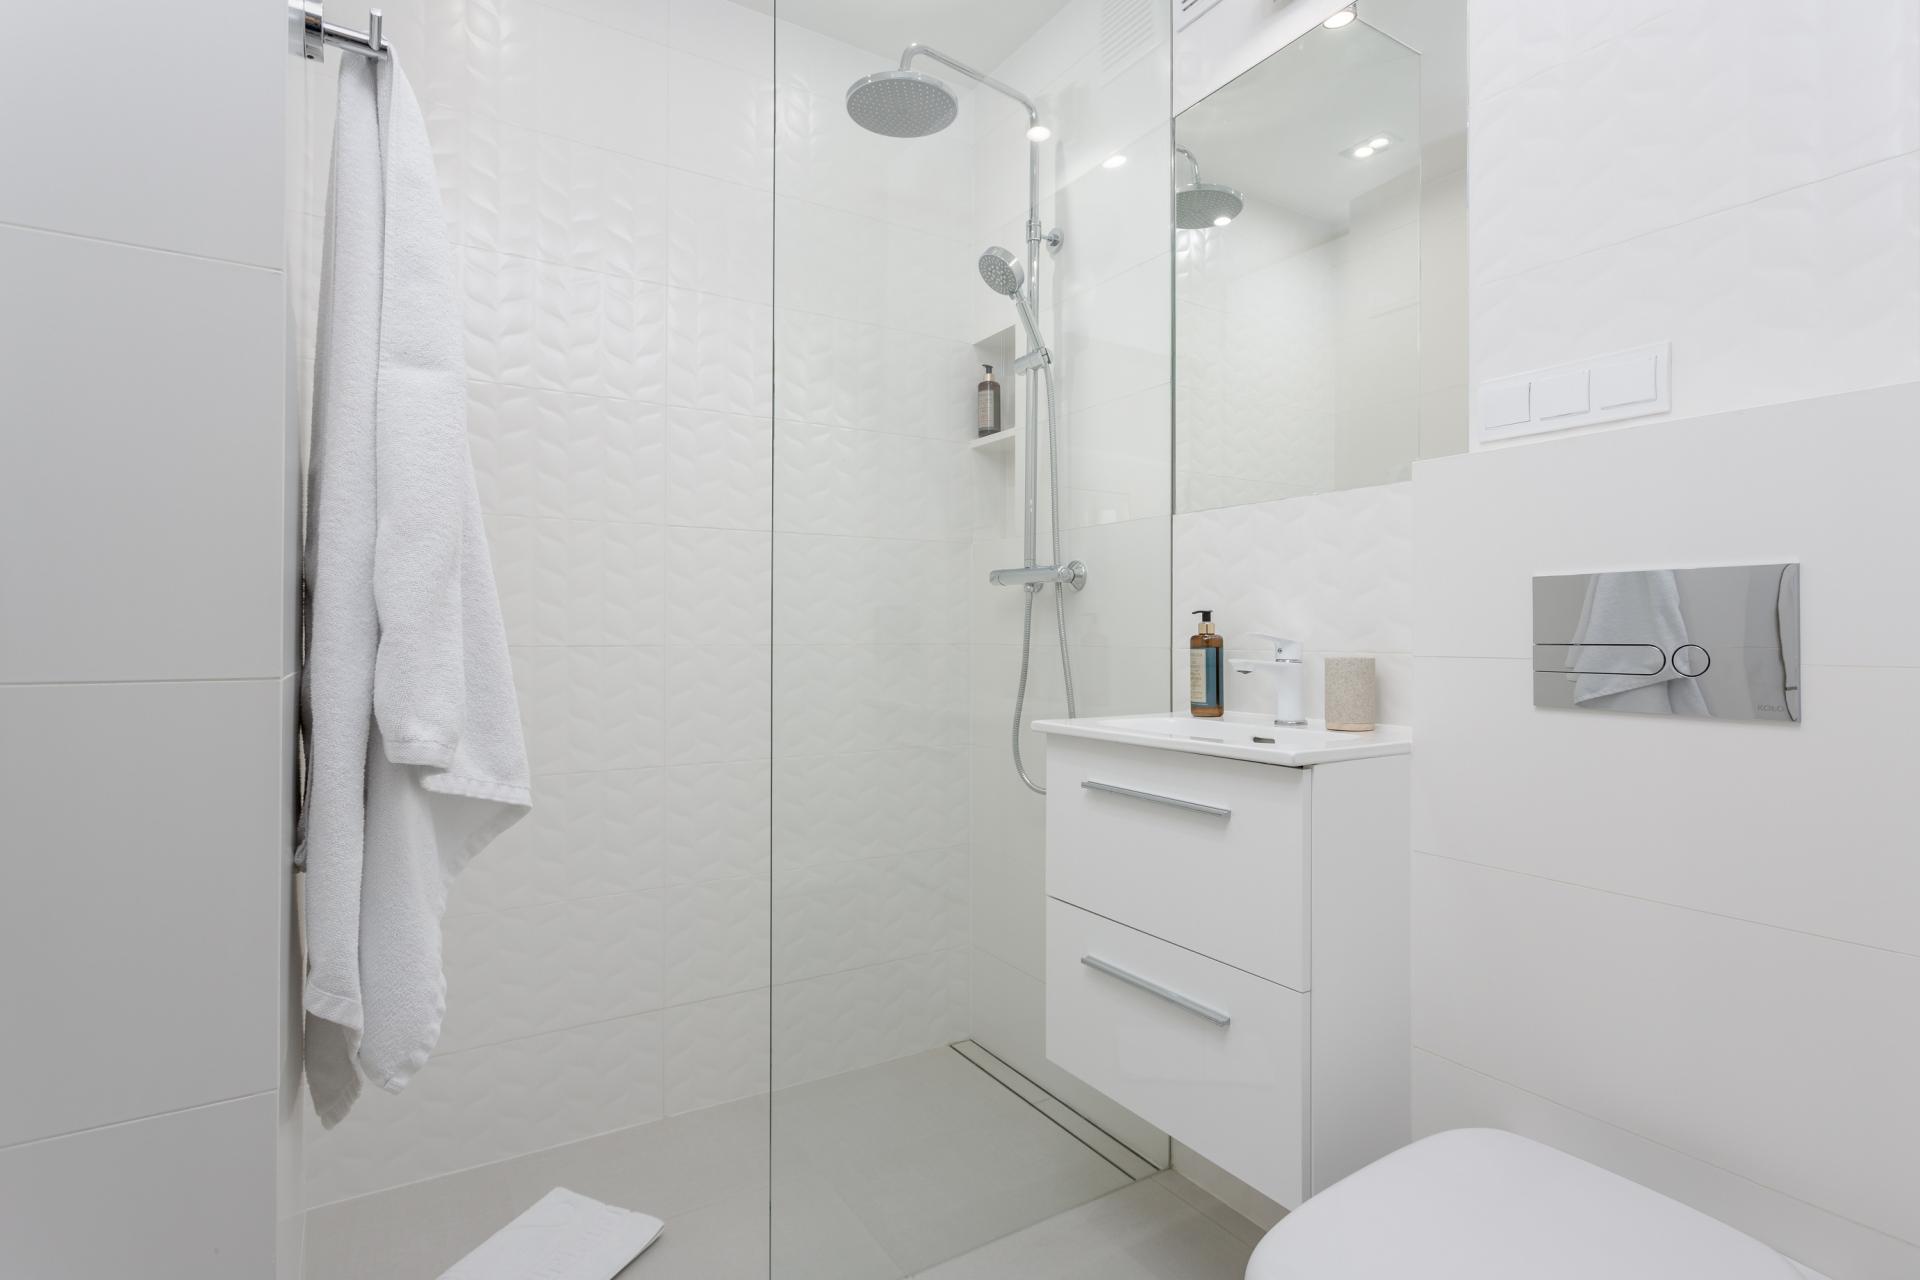 Bathroom at Grzybowska Apartment